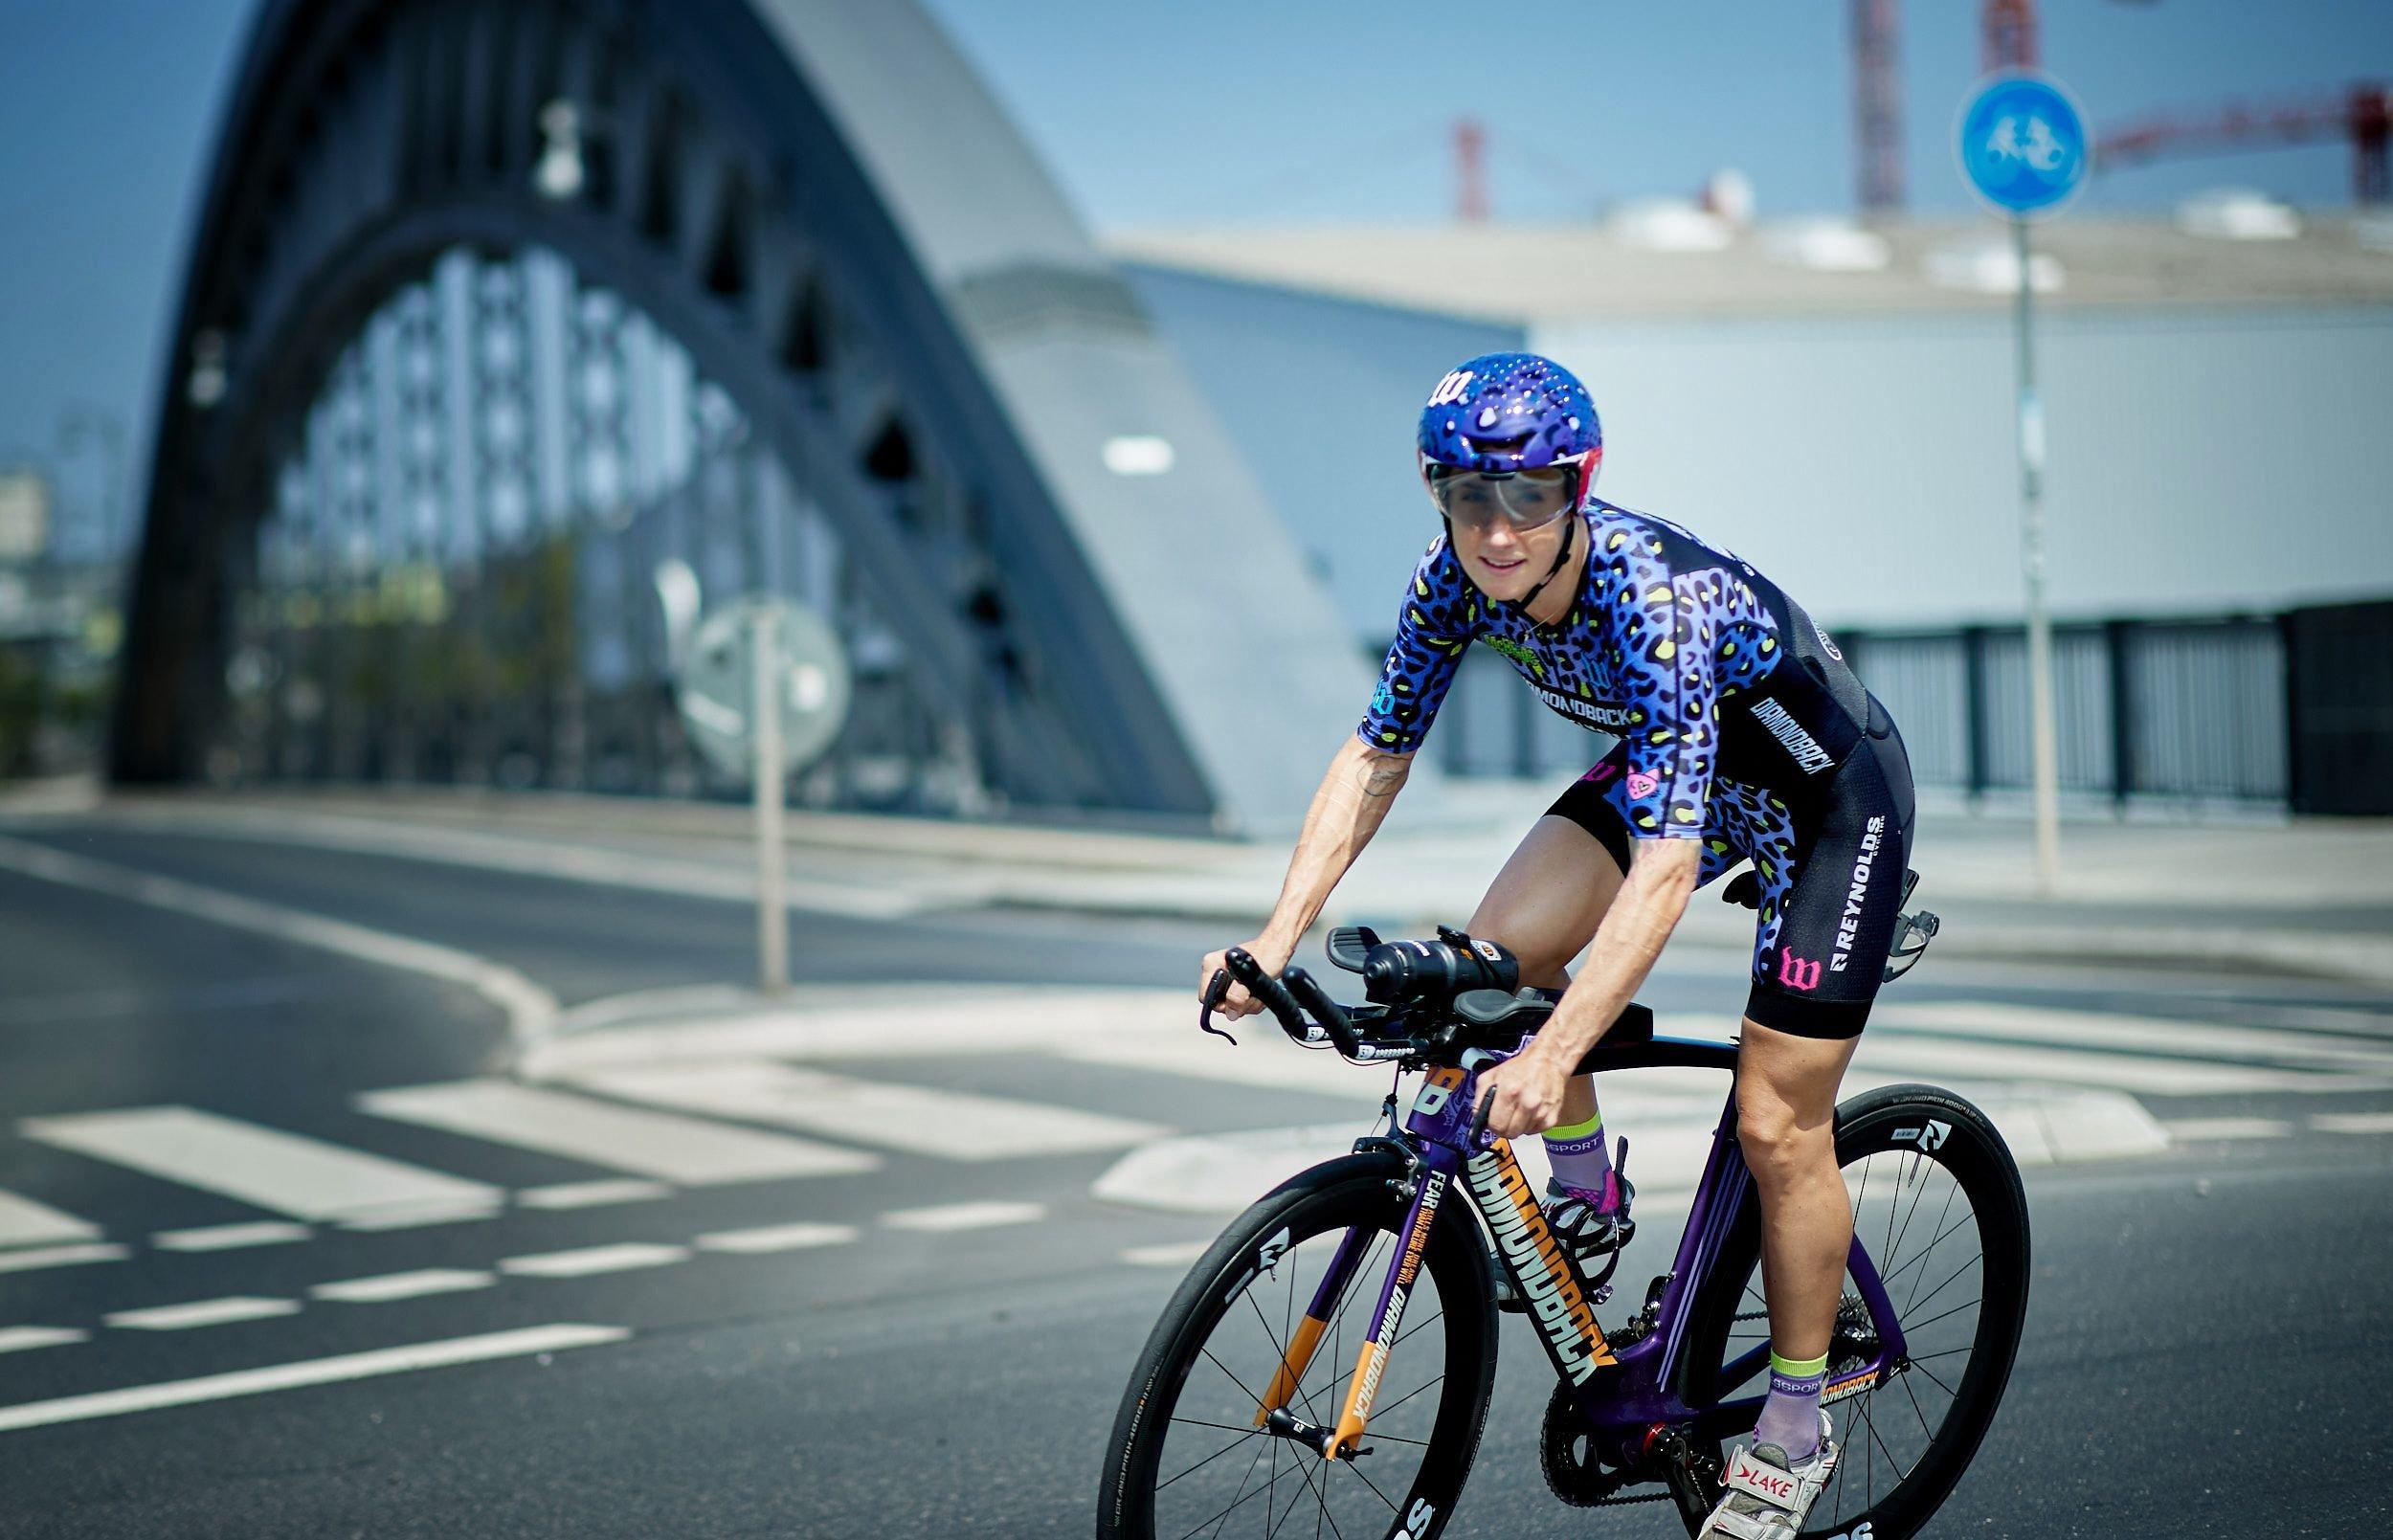 Coach_Terry_Wilson_Pursuit_of_The_Perfect_Race_IRONMAN_Franktfurt_Rachel_McBride_Isaak_Papadopoulos_Bike.jpg